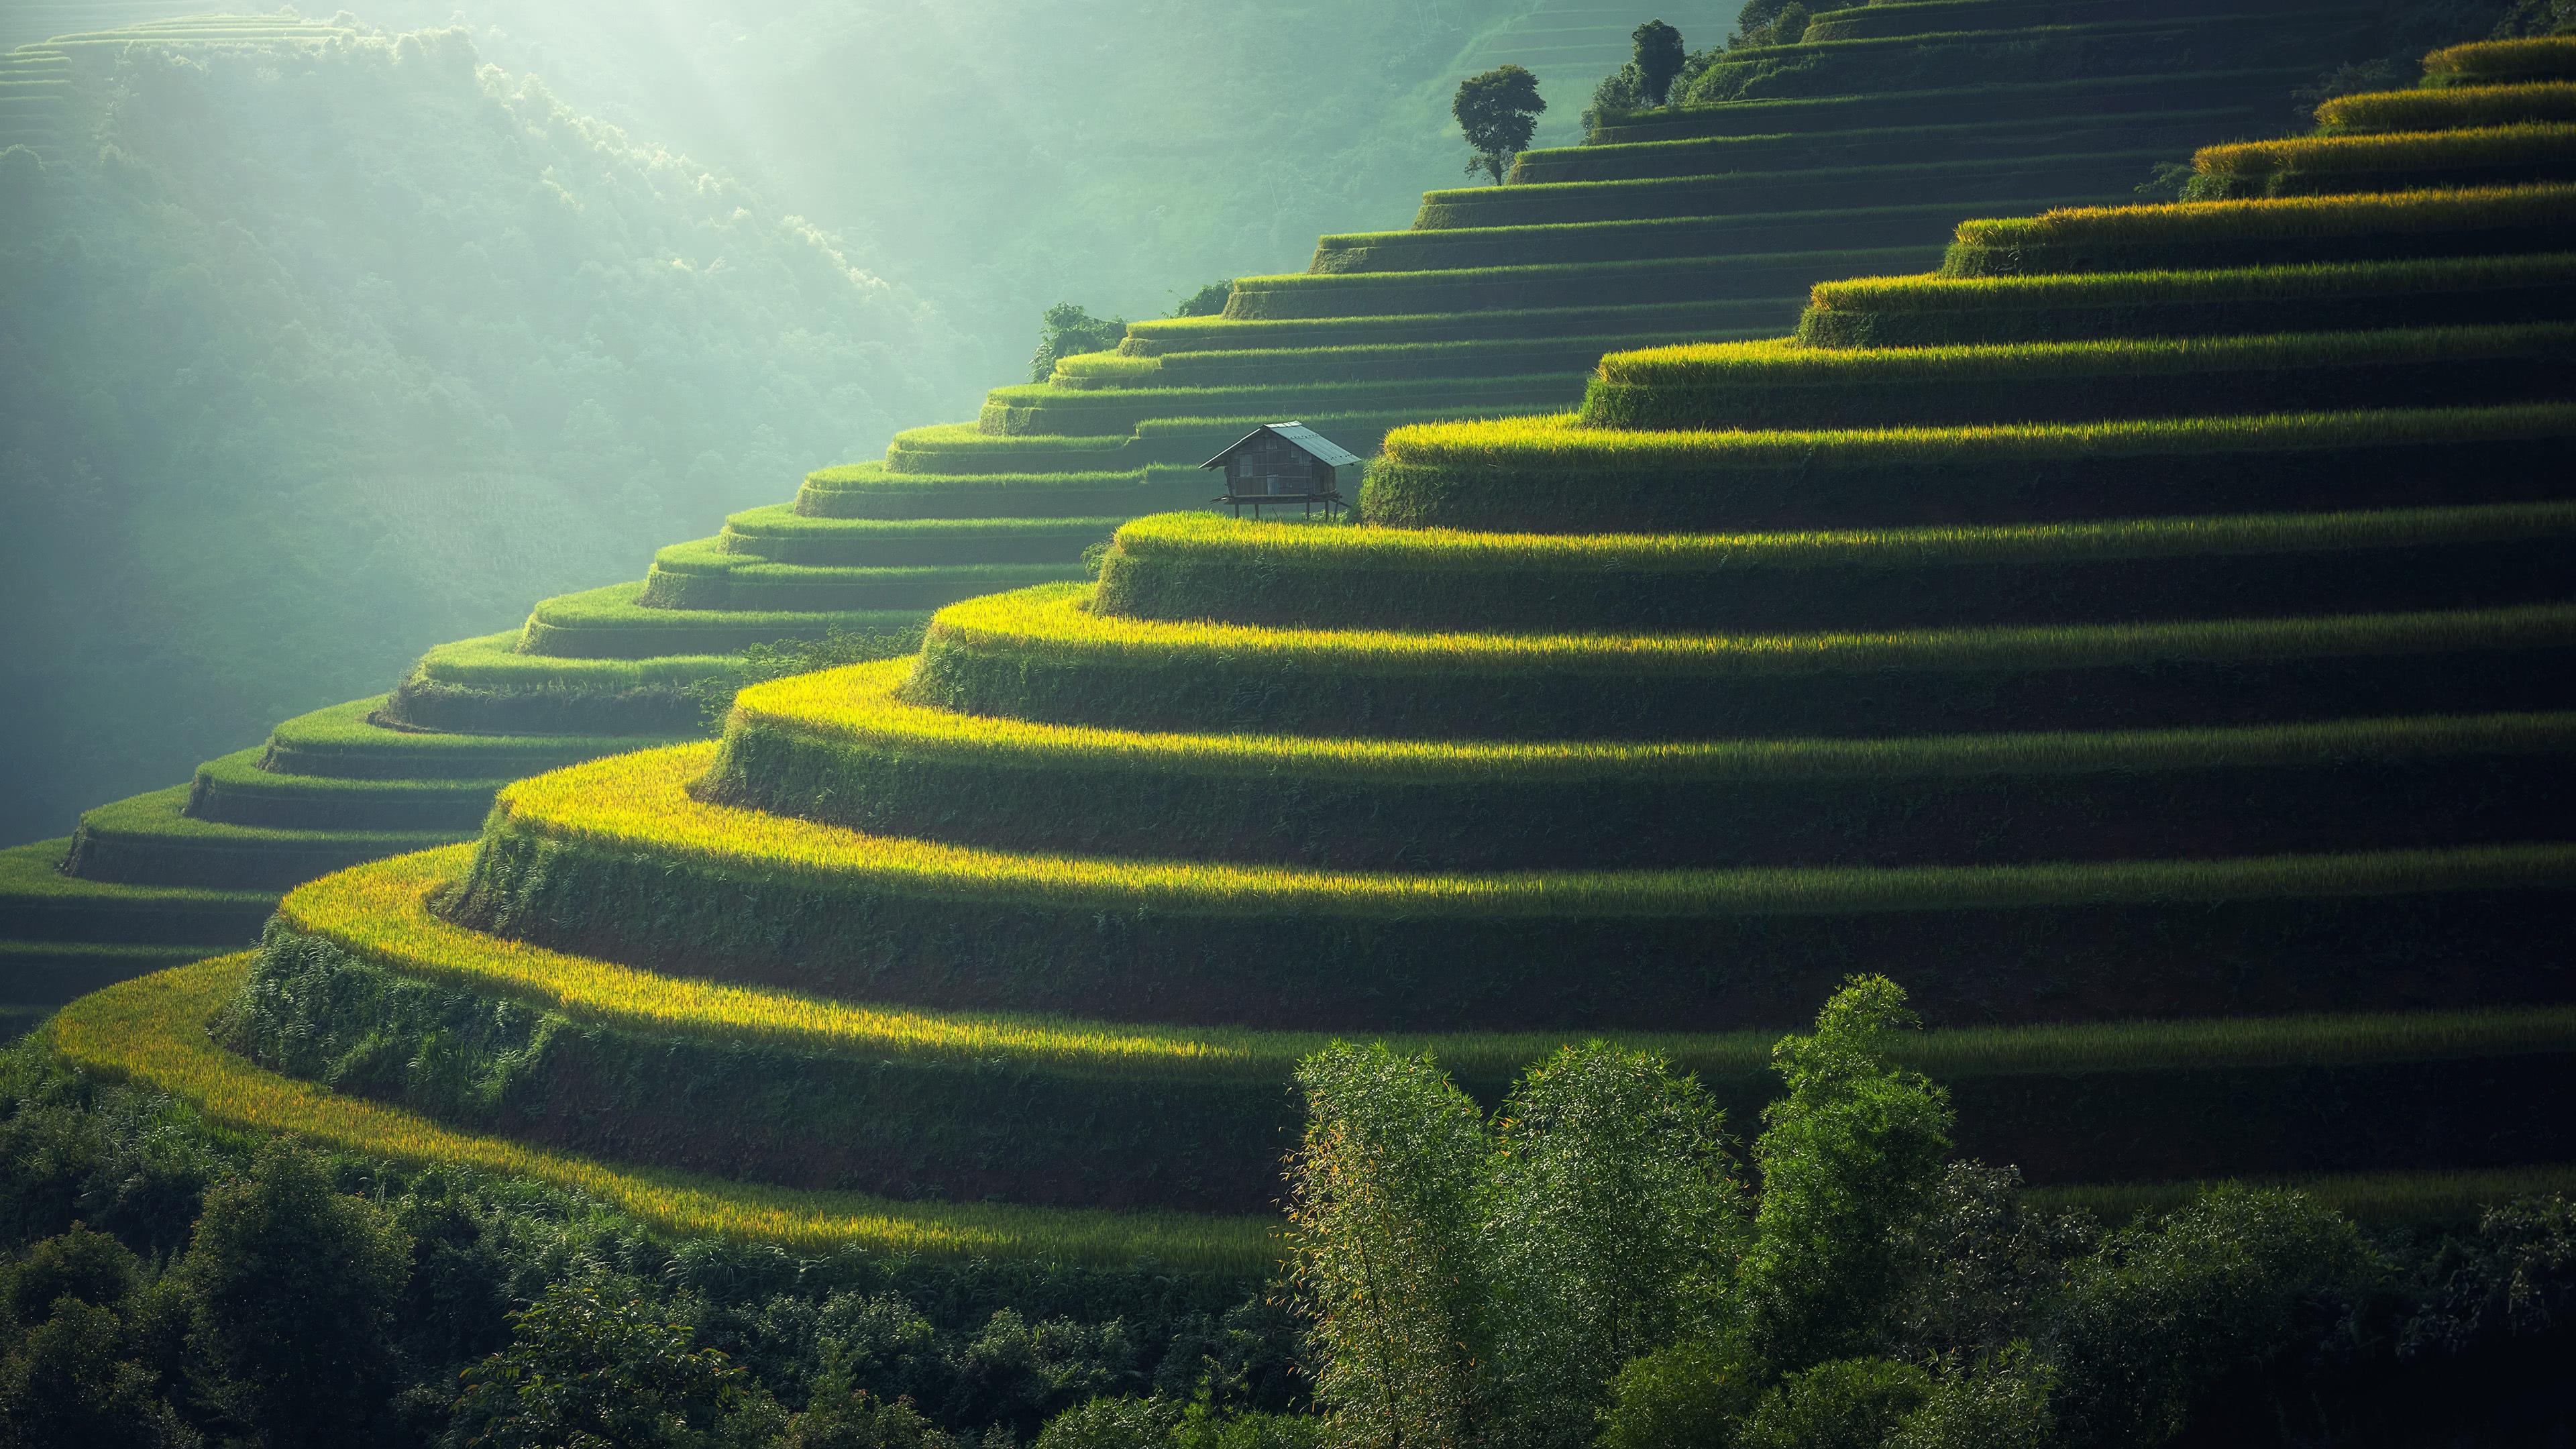 rice terraces uhd 4k wallpaper